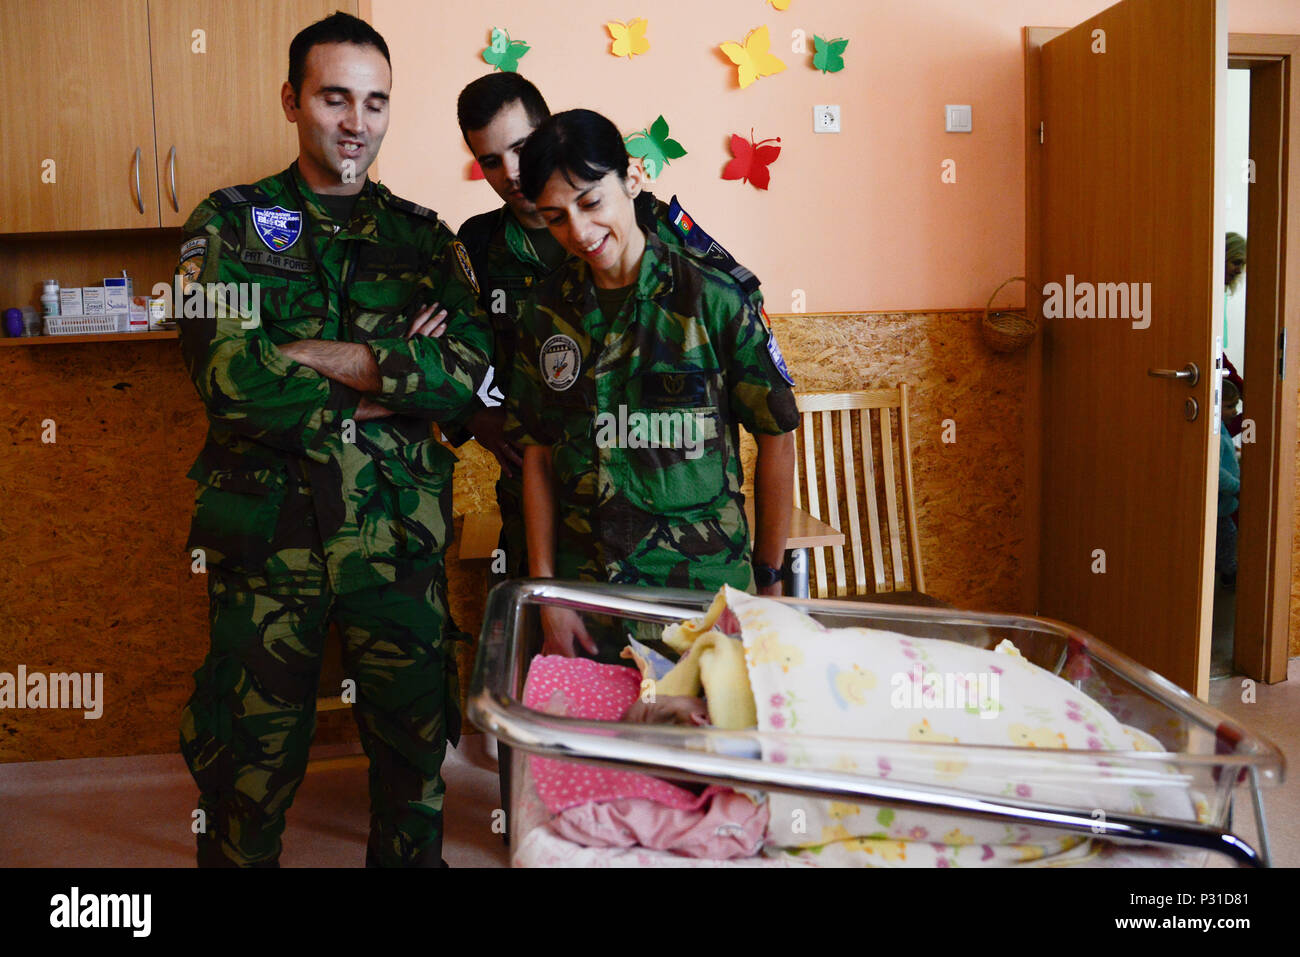 Portuguese airmen greet a baby from kudikiu namai during a portuguese airmen greet a baby from kudikiu namai during a humanitarian civil assistance hca project in sauliai lithuania august 23 2016 m4hsunfo